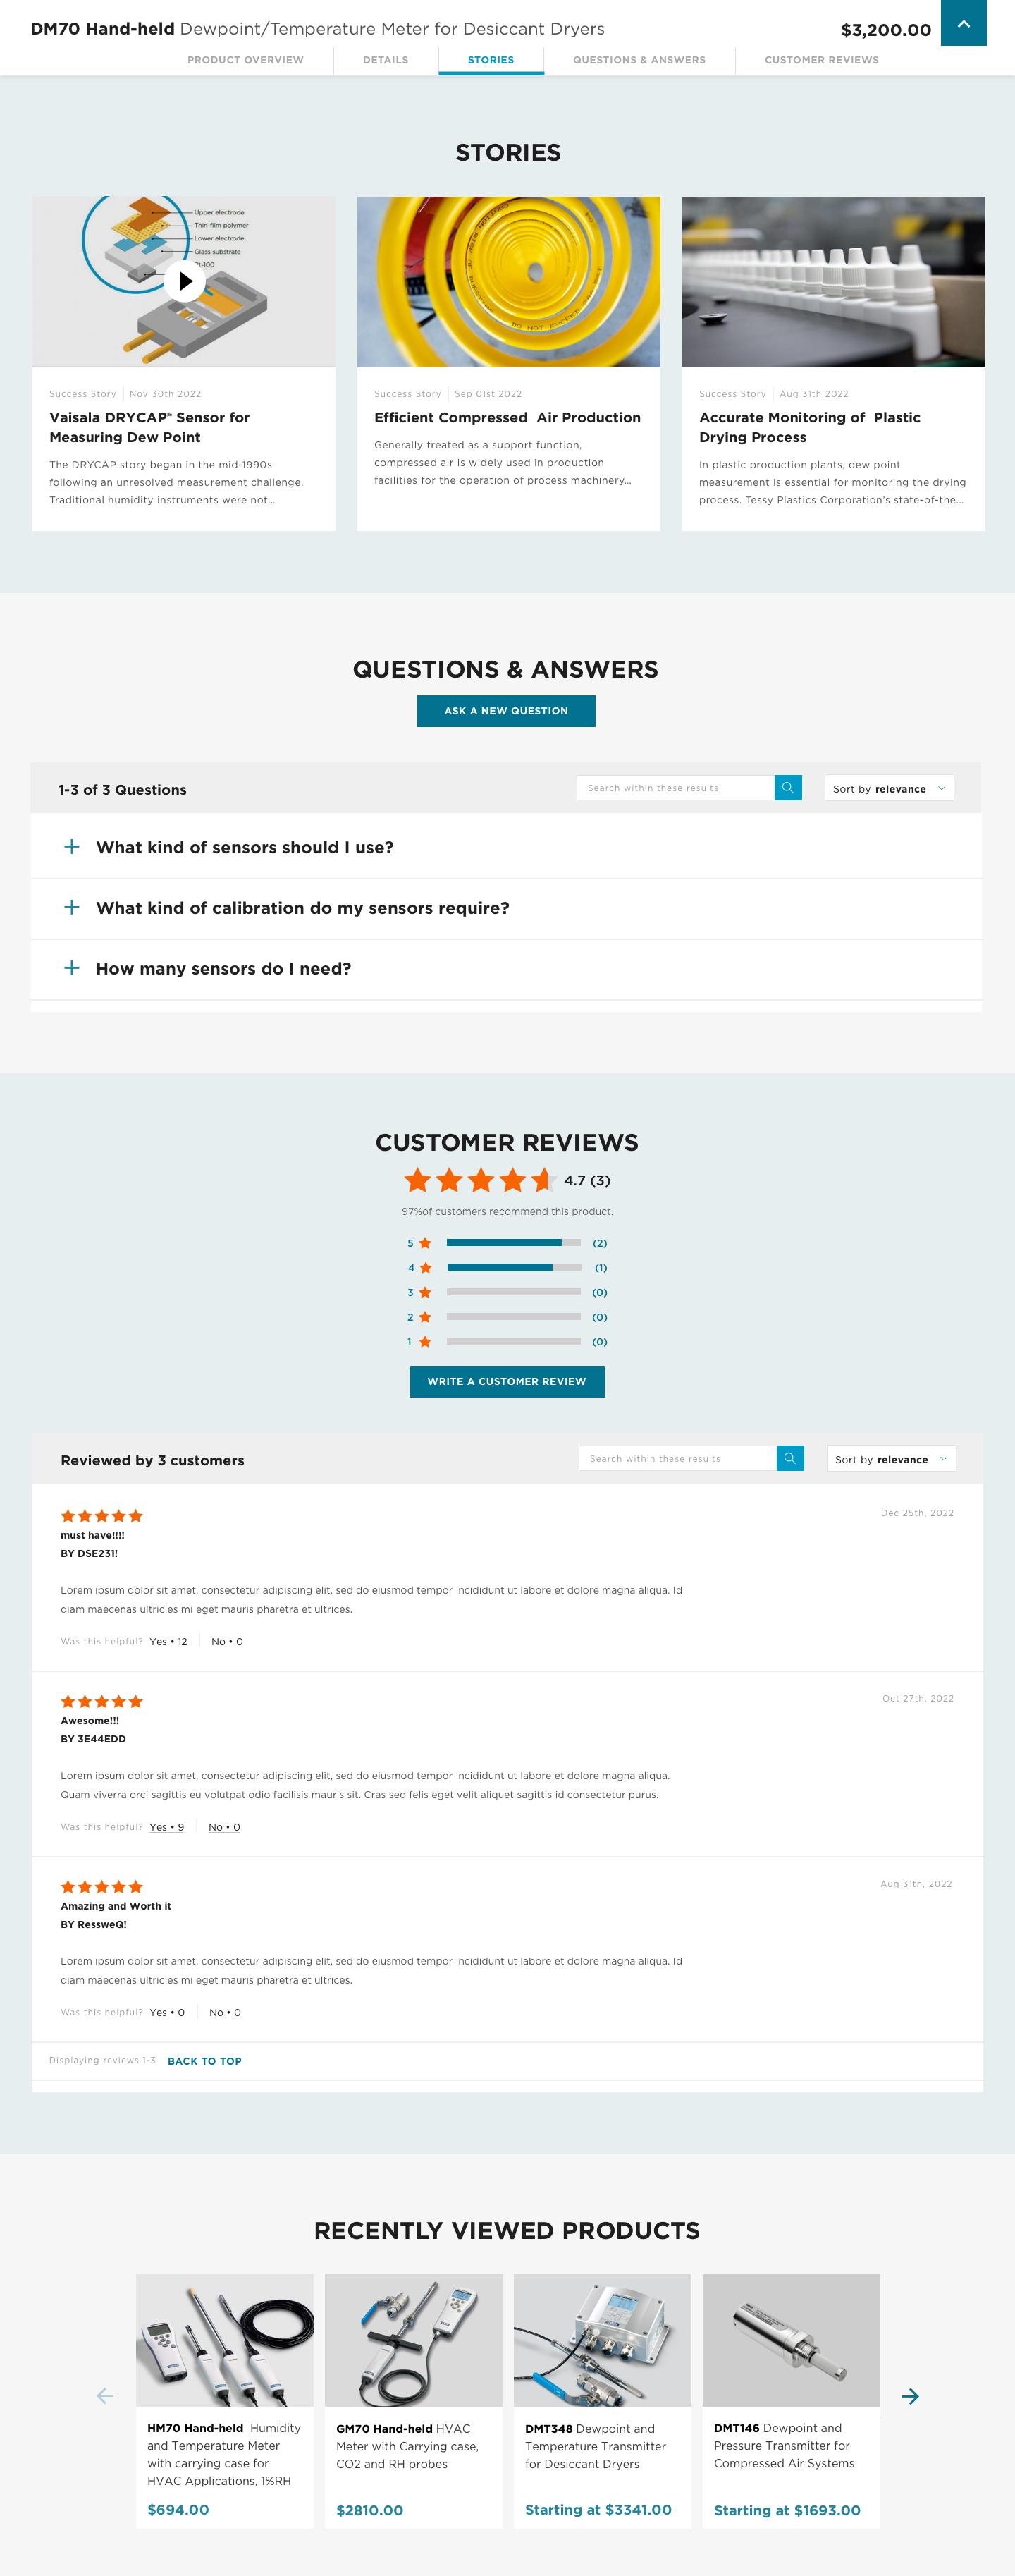 Vaisala online store product details